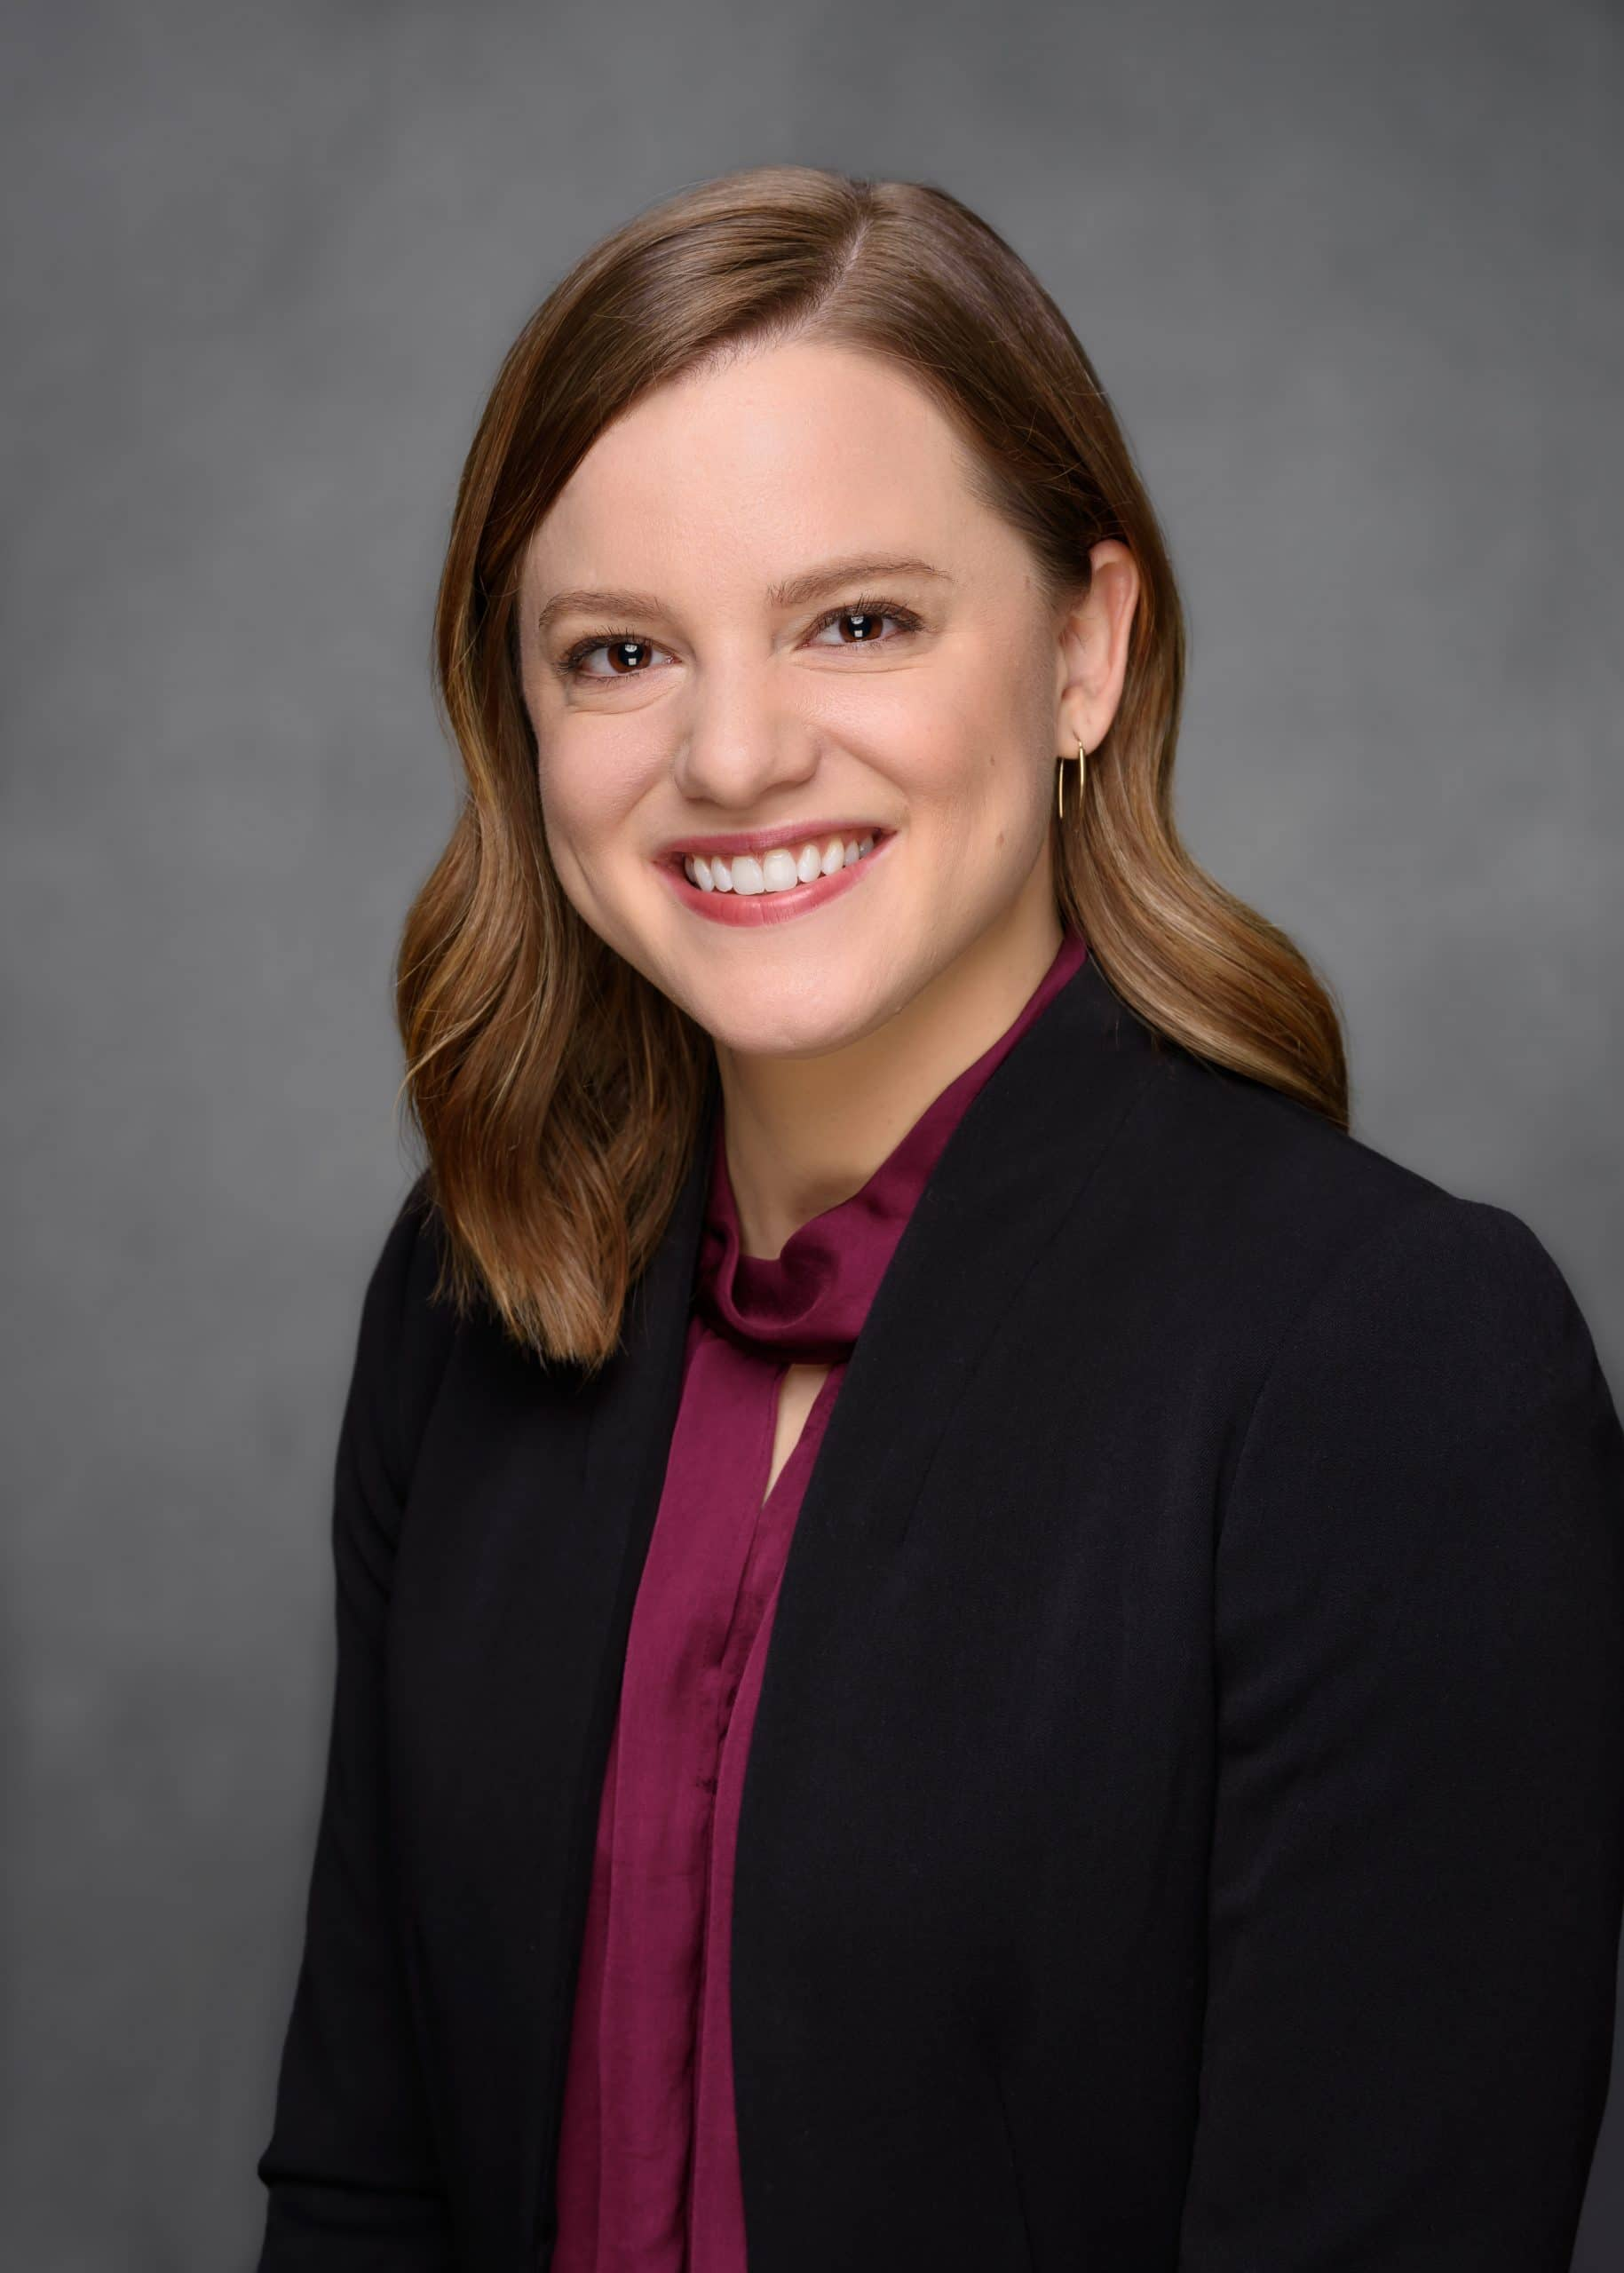 Katelyn Kelley, PA-C Jacksonville Dermatologist